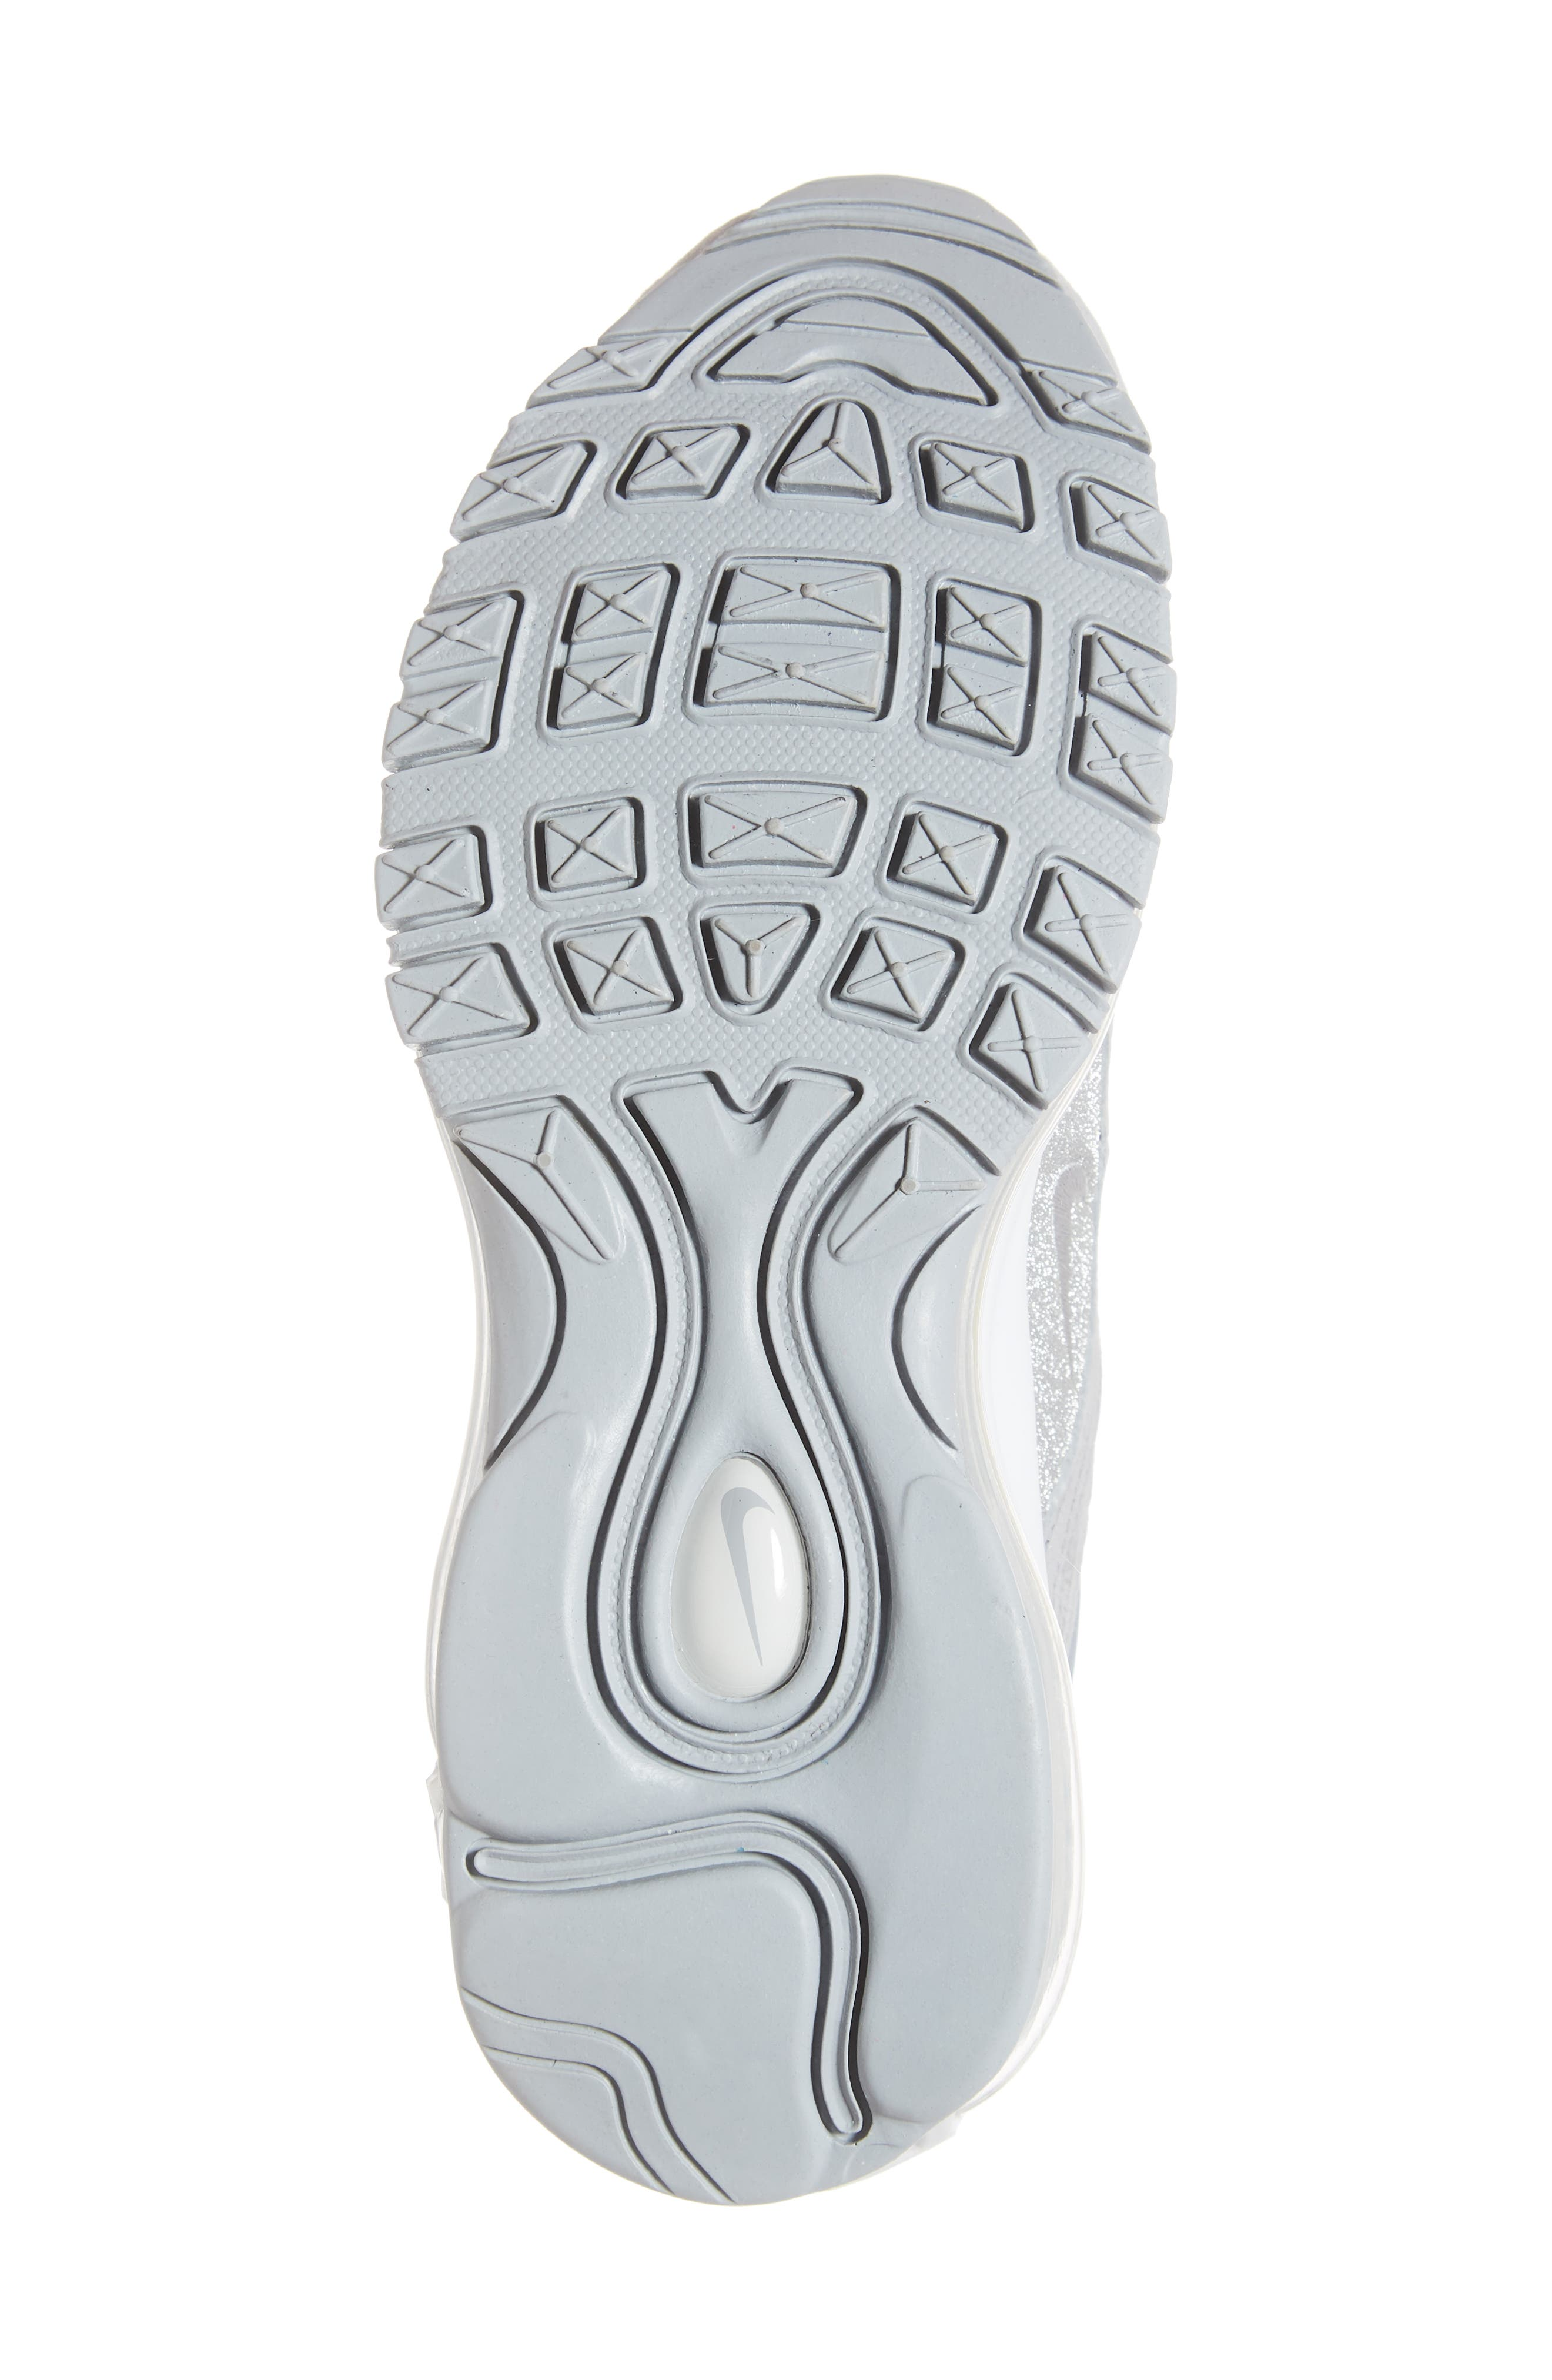 Air Max 97 Sneaker,                             Alternate thumbnail 6, color,                             WOLF GREY/ PLATINUM/ WHITE